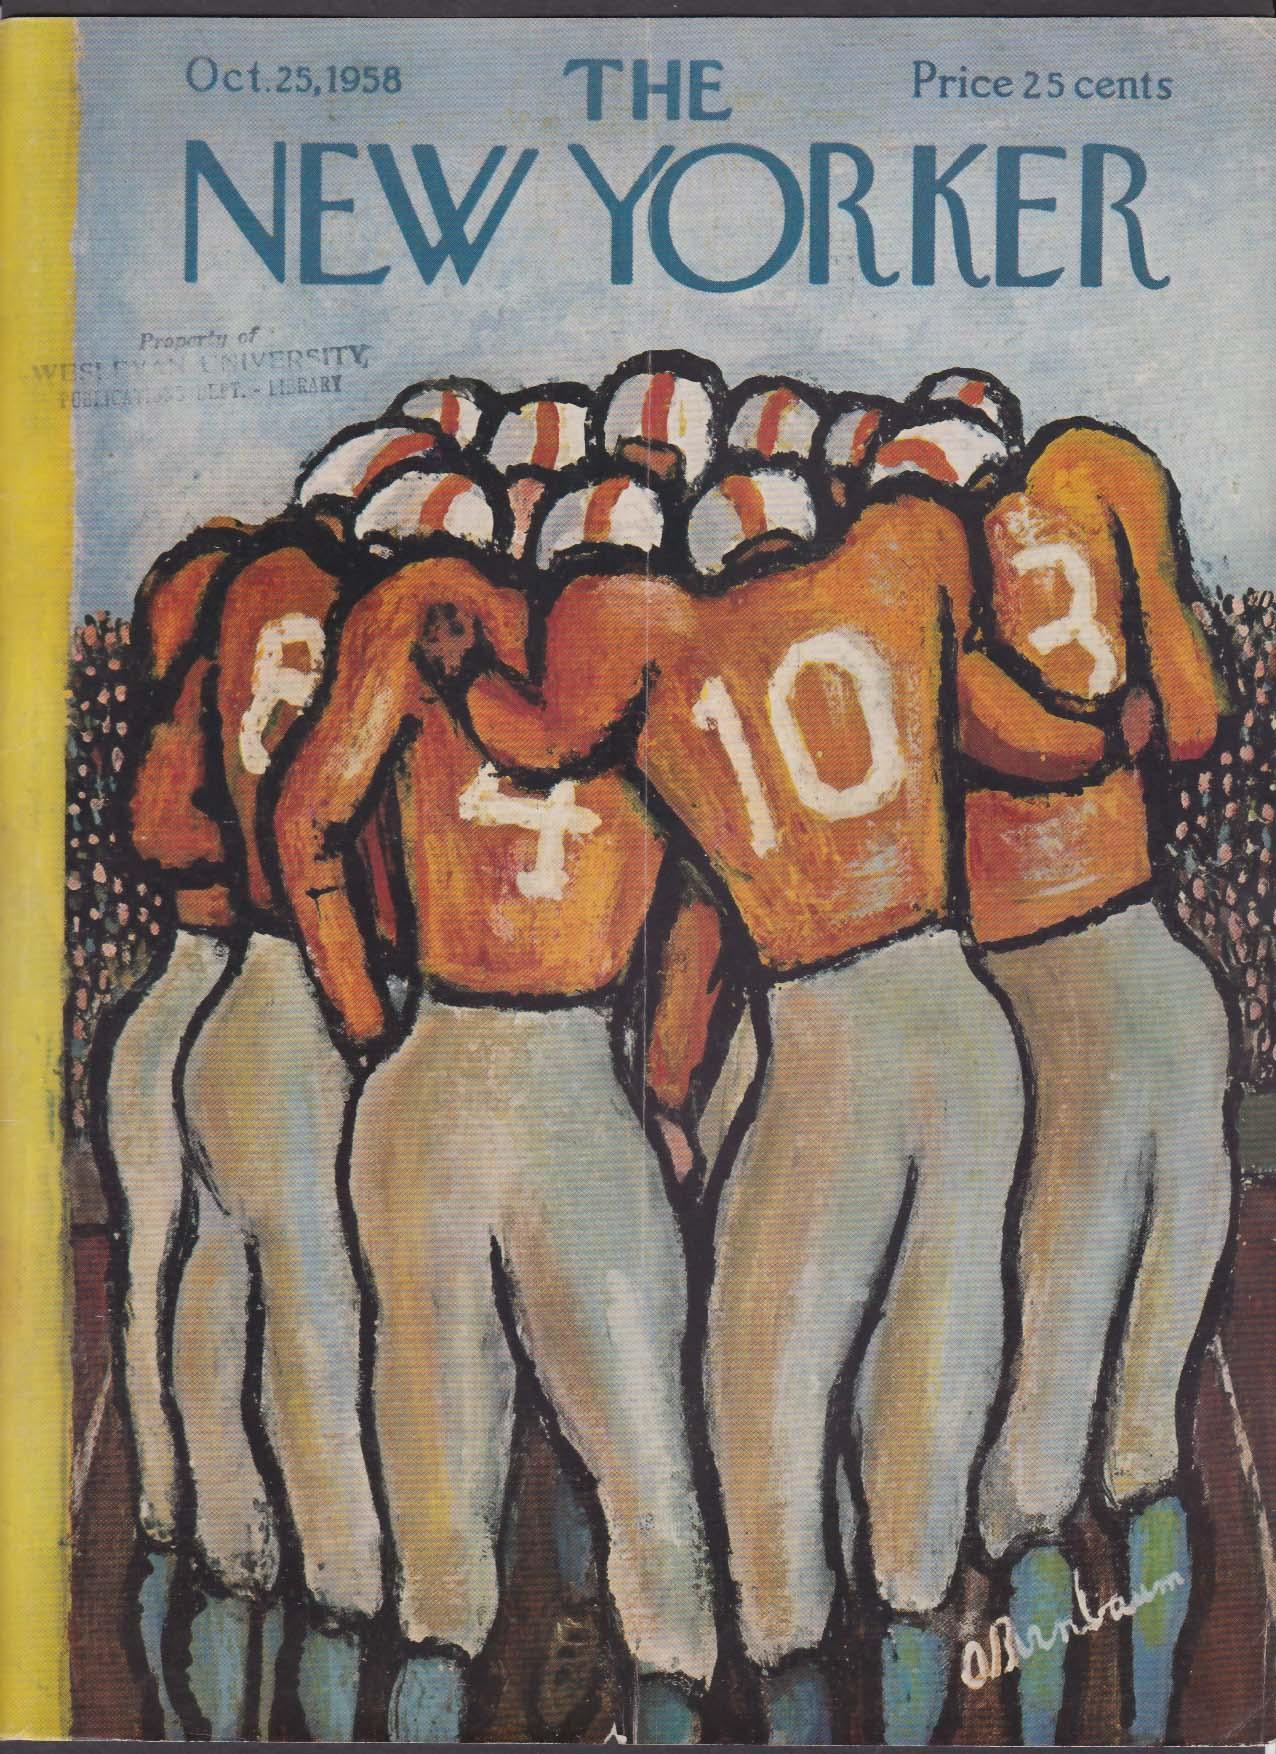 New Yorker cover Birnbaum football huddle 10/25 1958